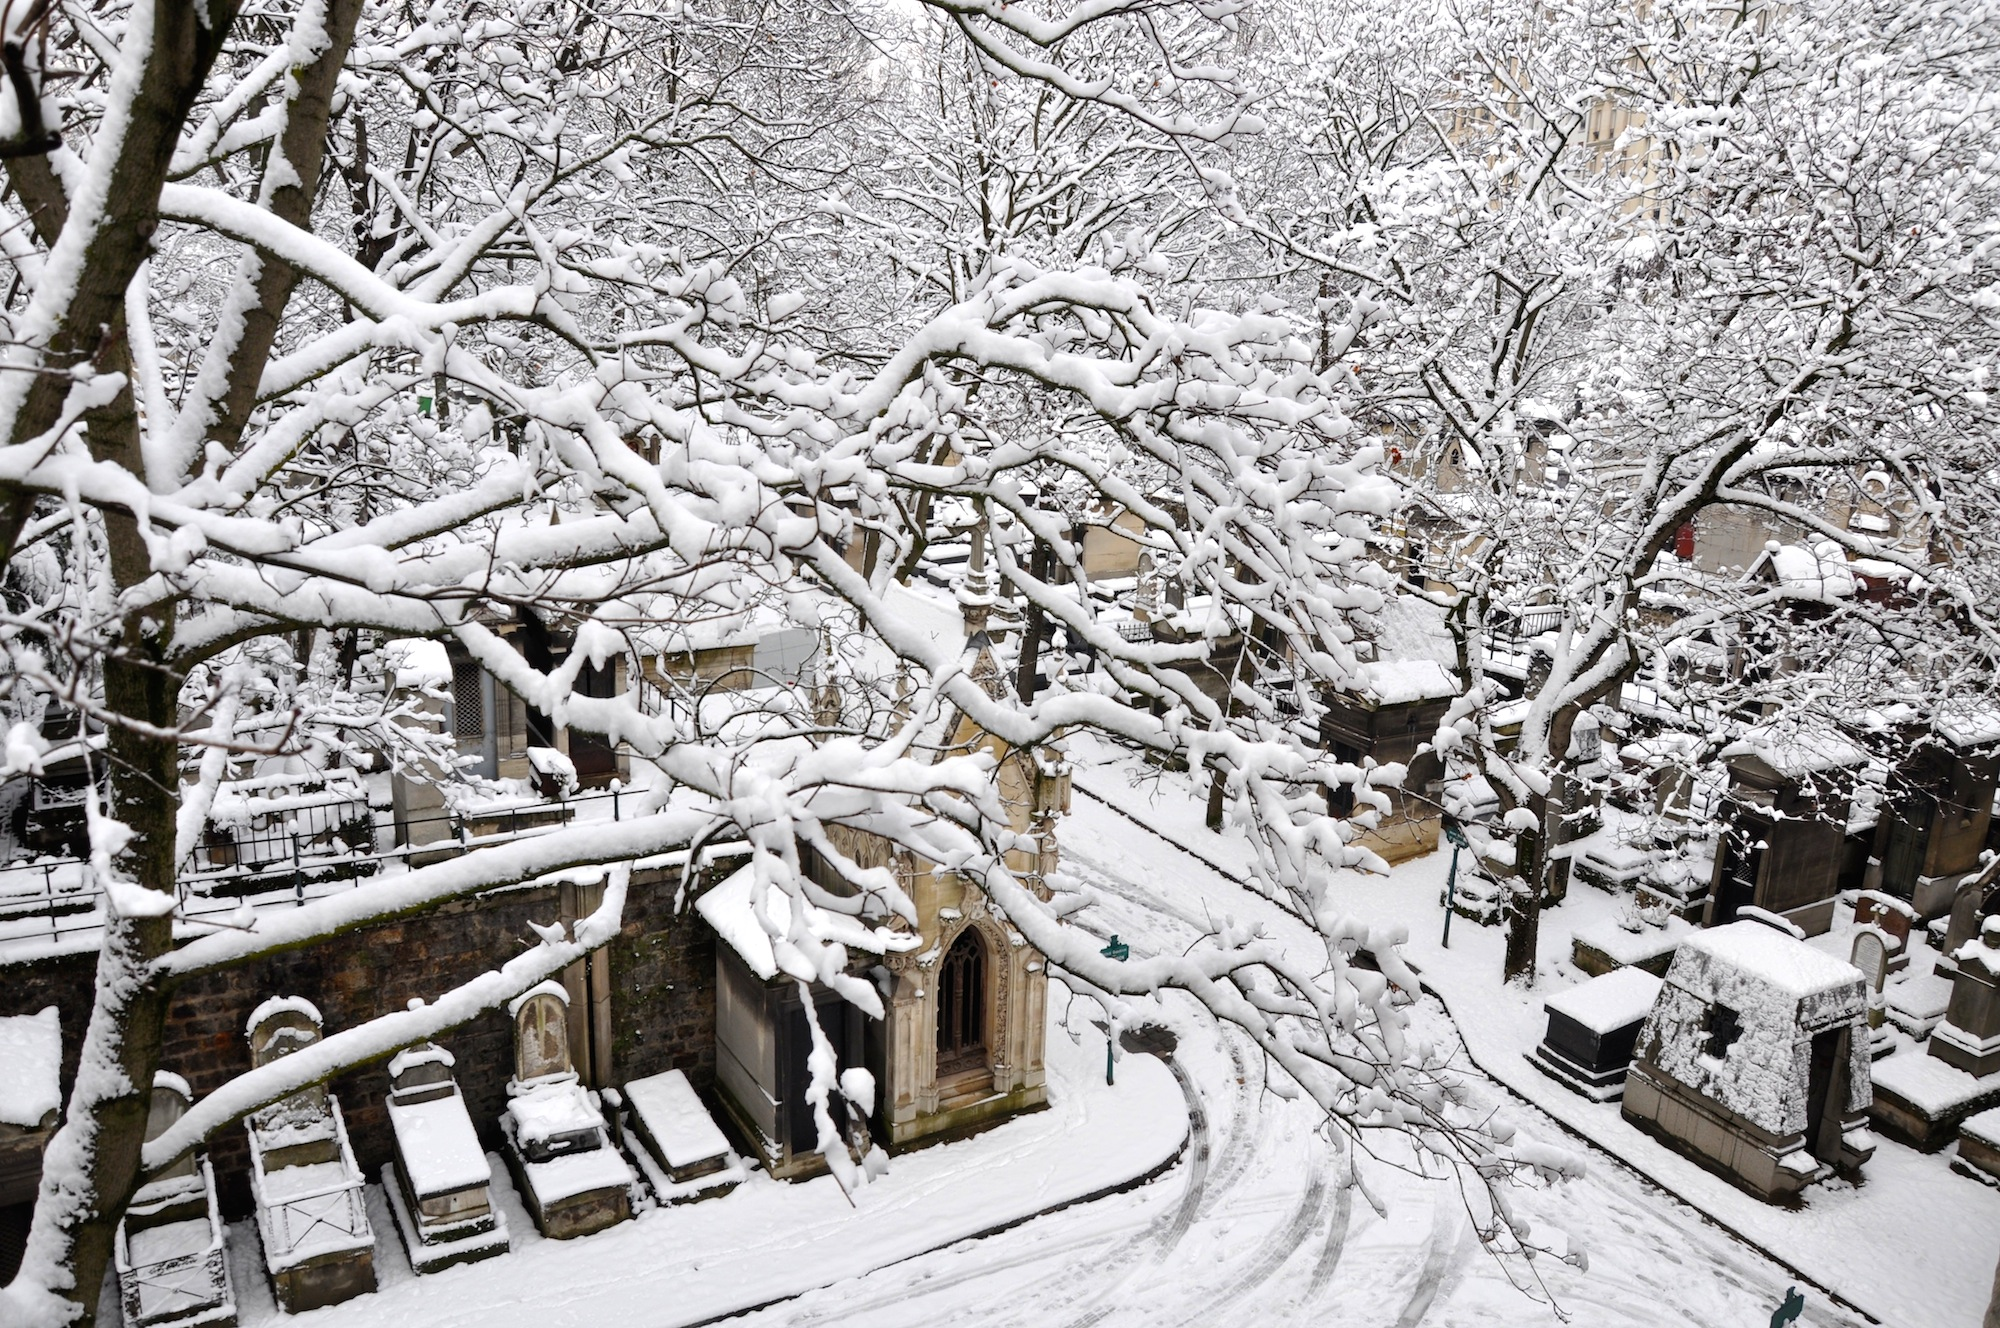 HiP Paris Blog covers the recent snowfall in Paris